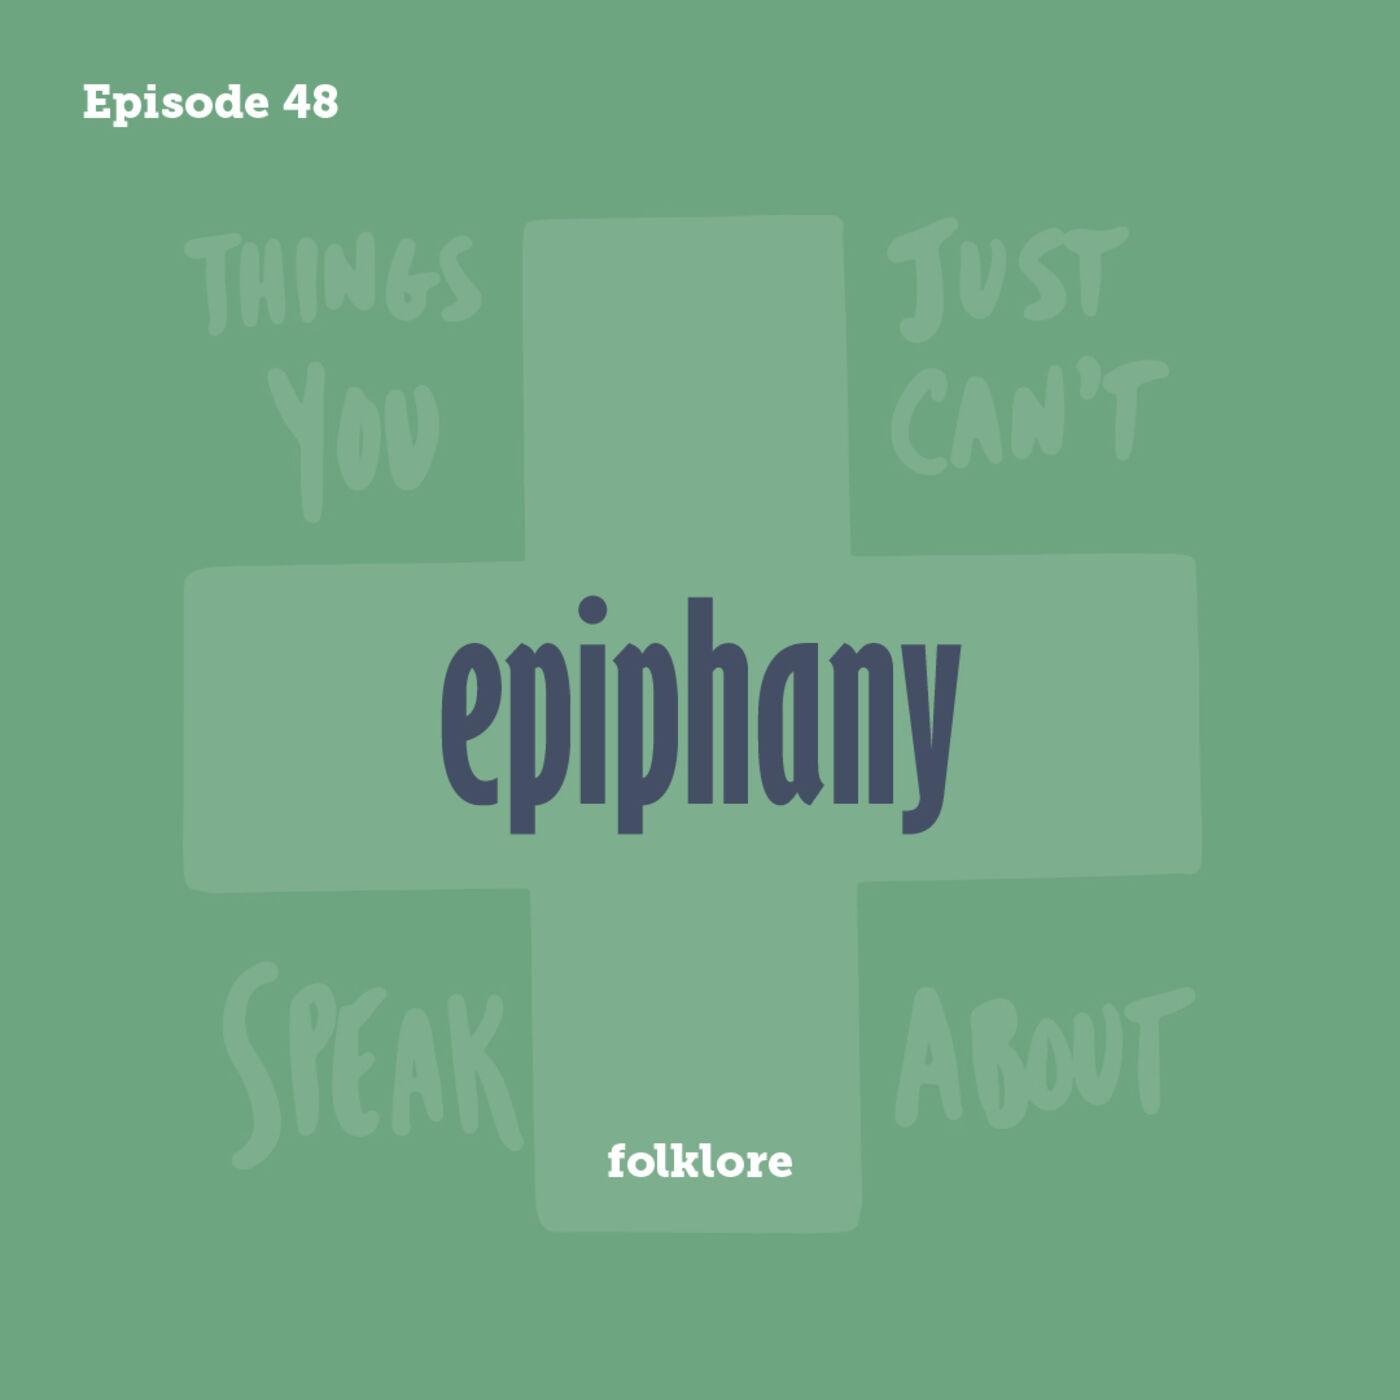 Tay to Z Episode 48: epiphany